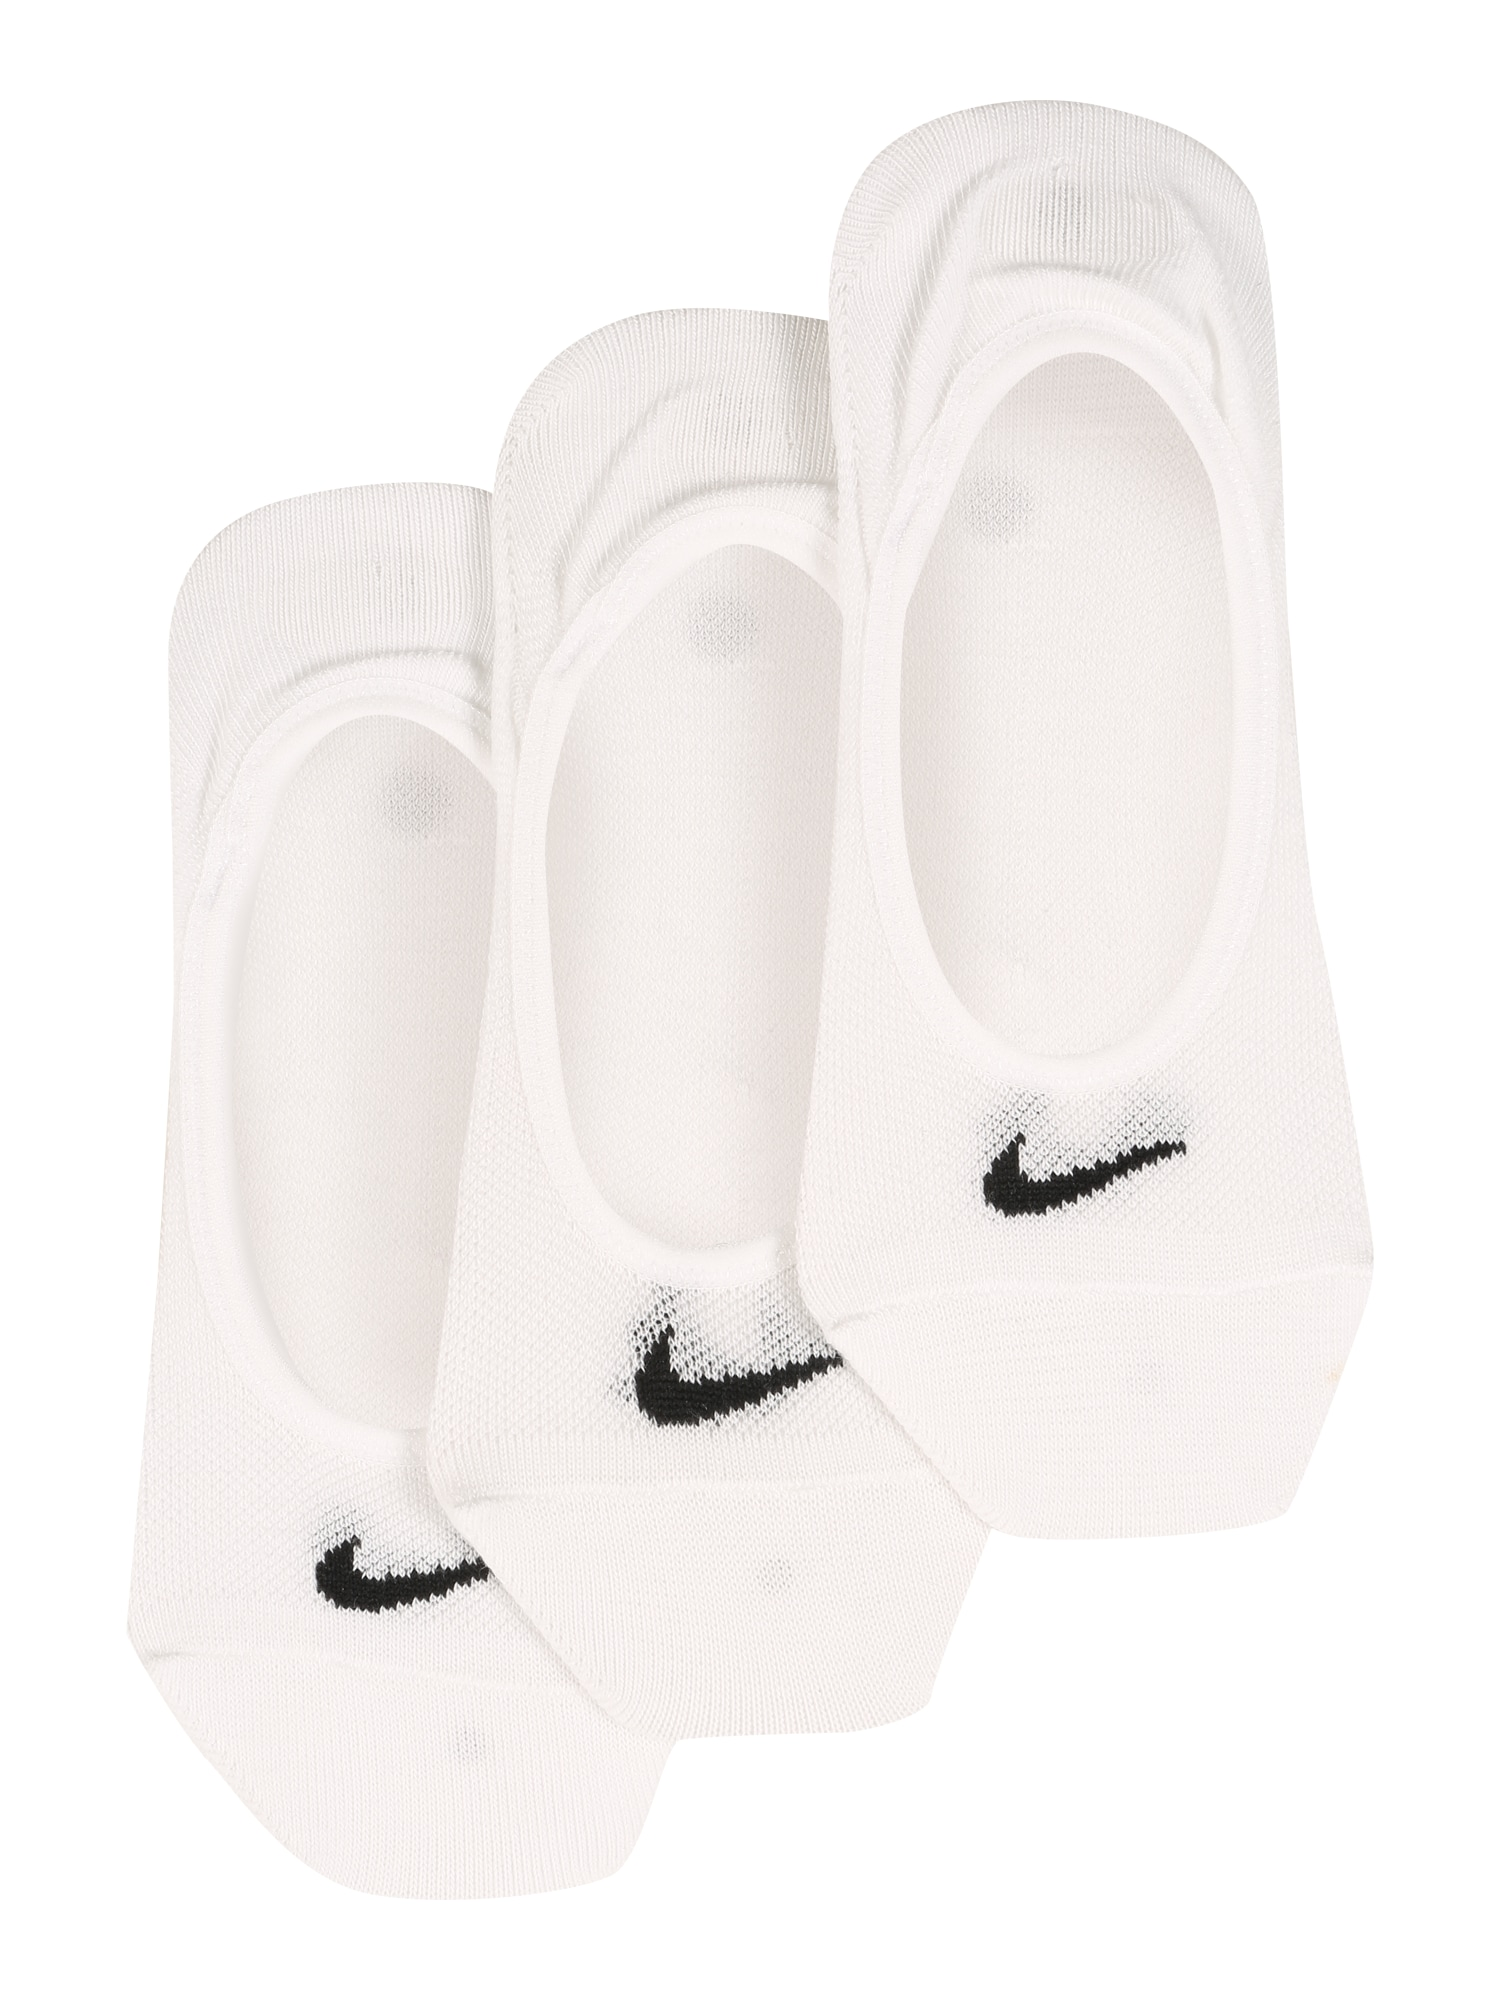 Nike Sportswear Ťapky 'Lightweight No-Show'  černá / bílá